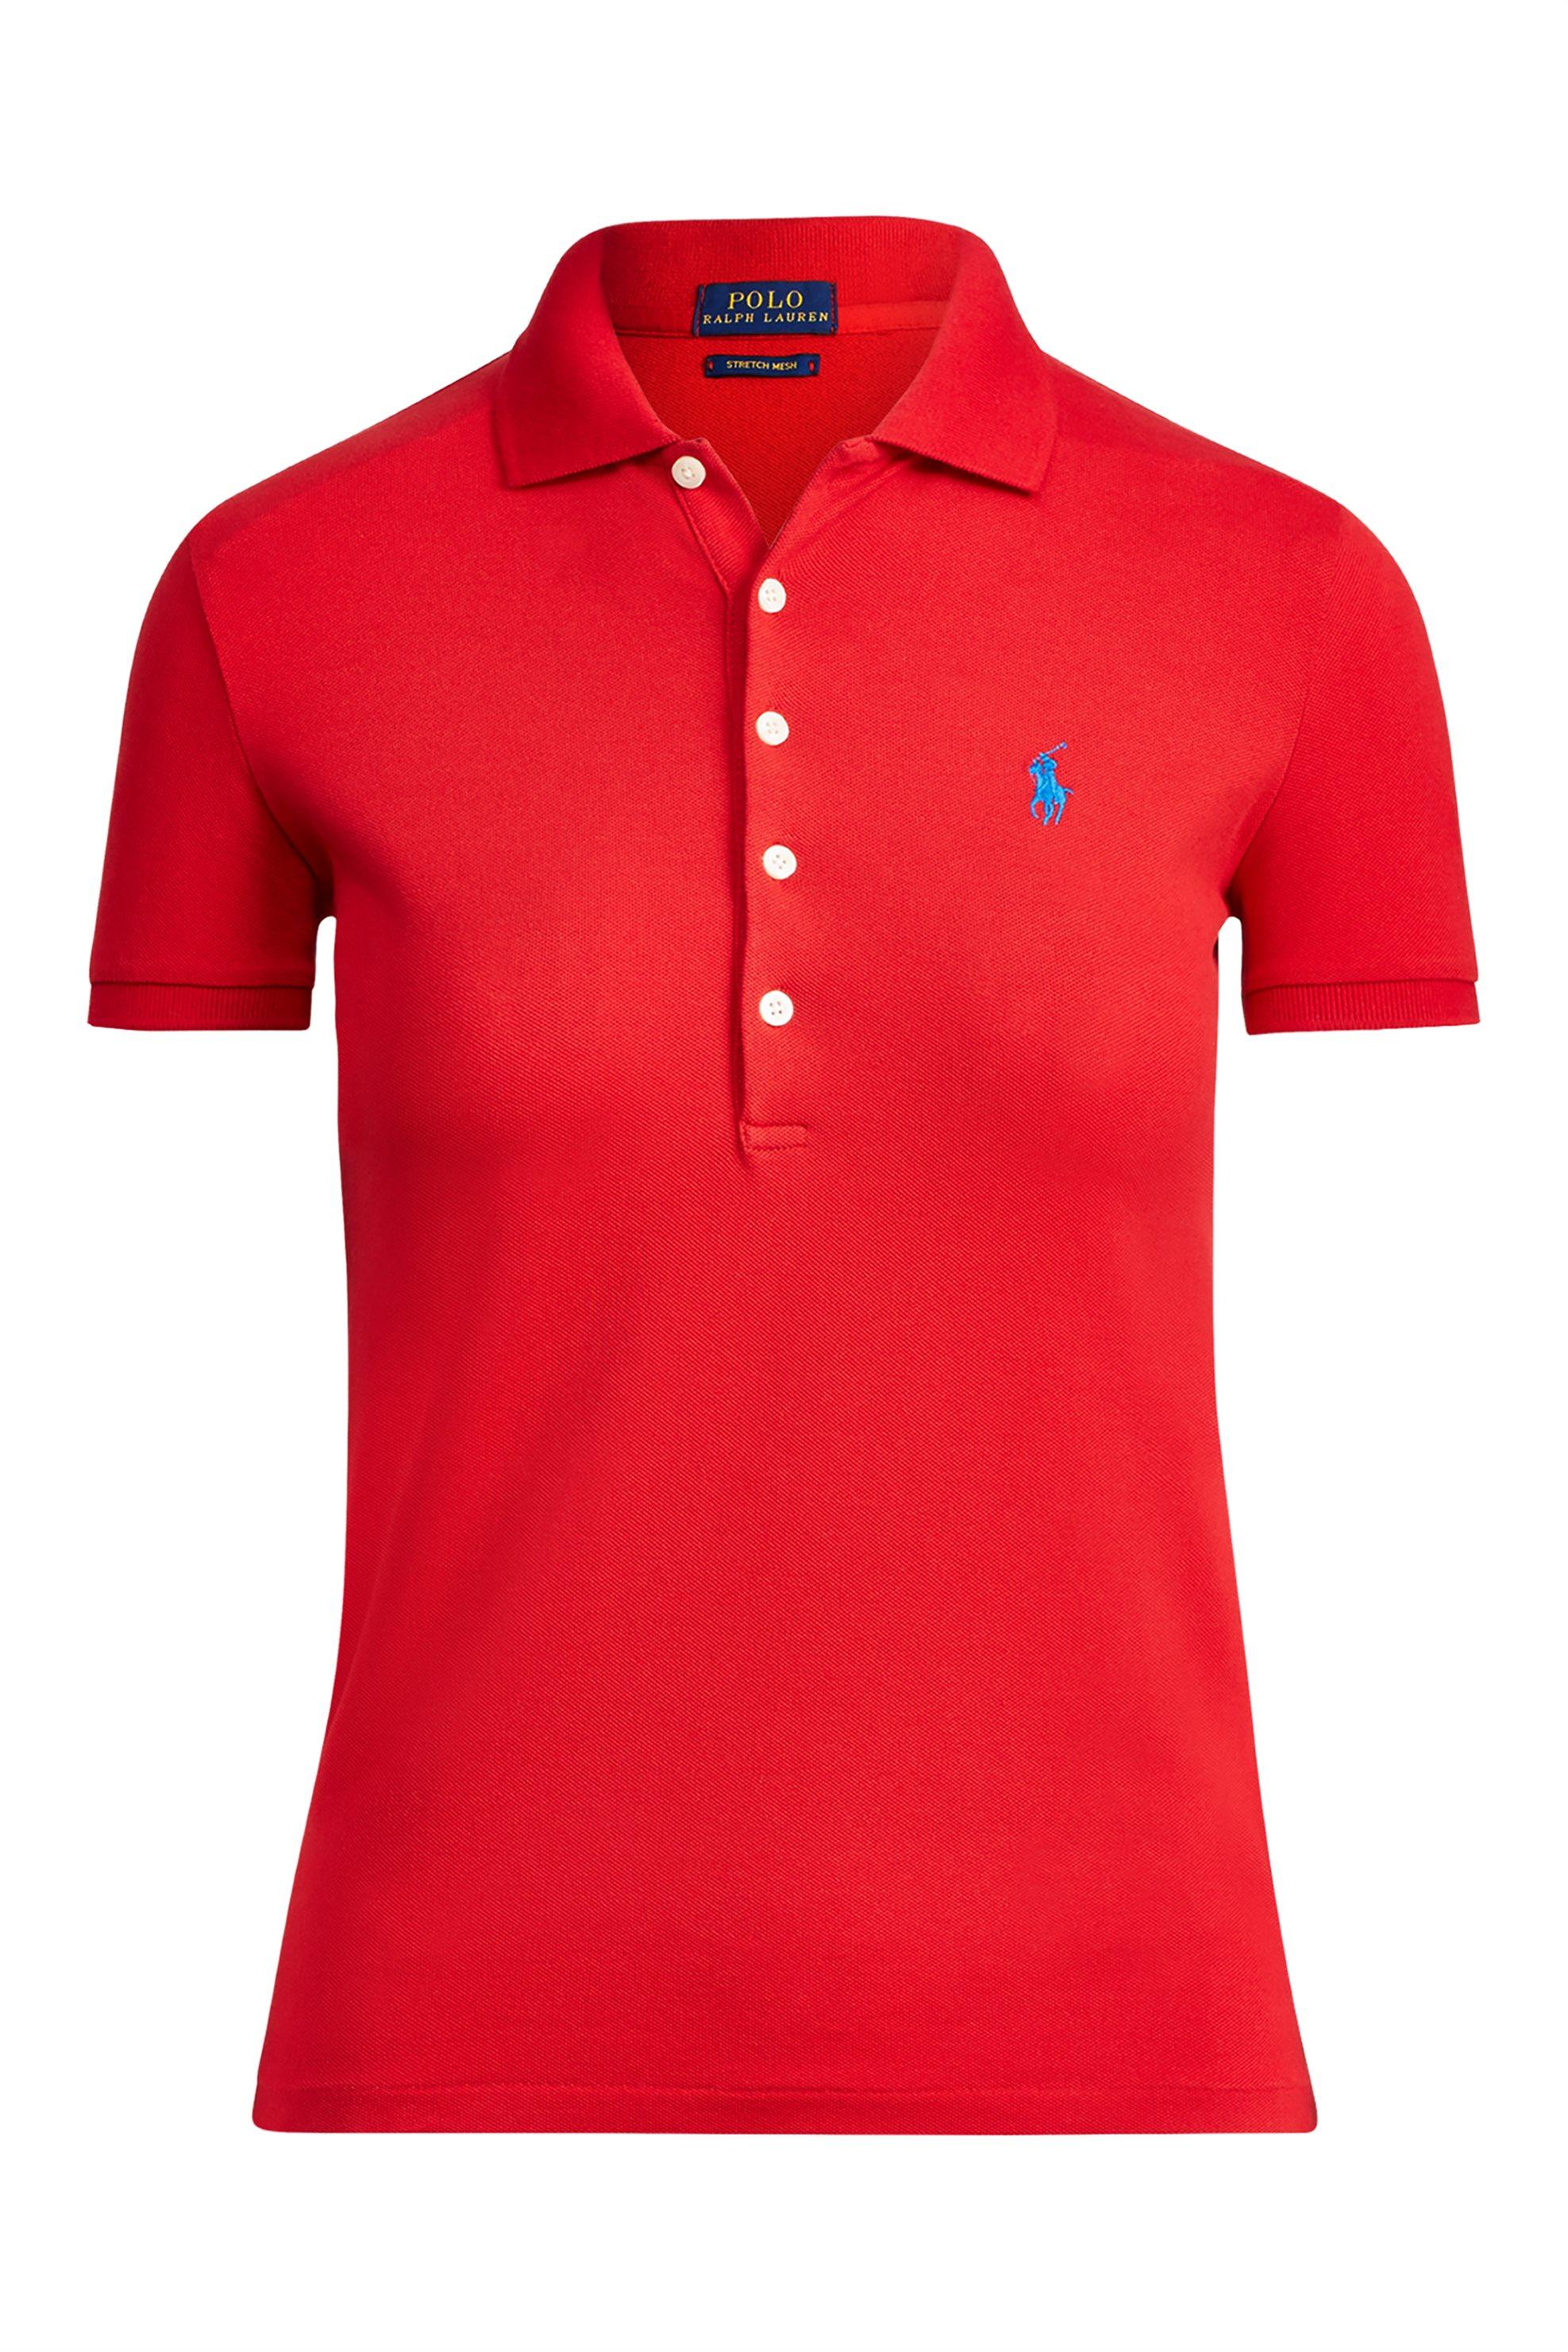 9eb91d92affe Notos Polo Ralph Lauren γυναικεία μπλούζα Polo Slim Fit Stretch -  211505654113 - Κόκκινο